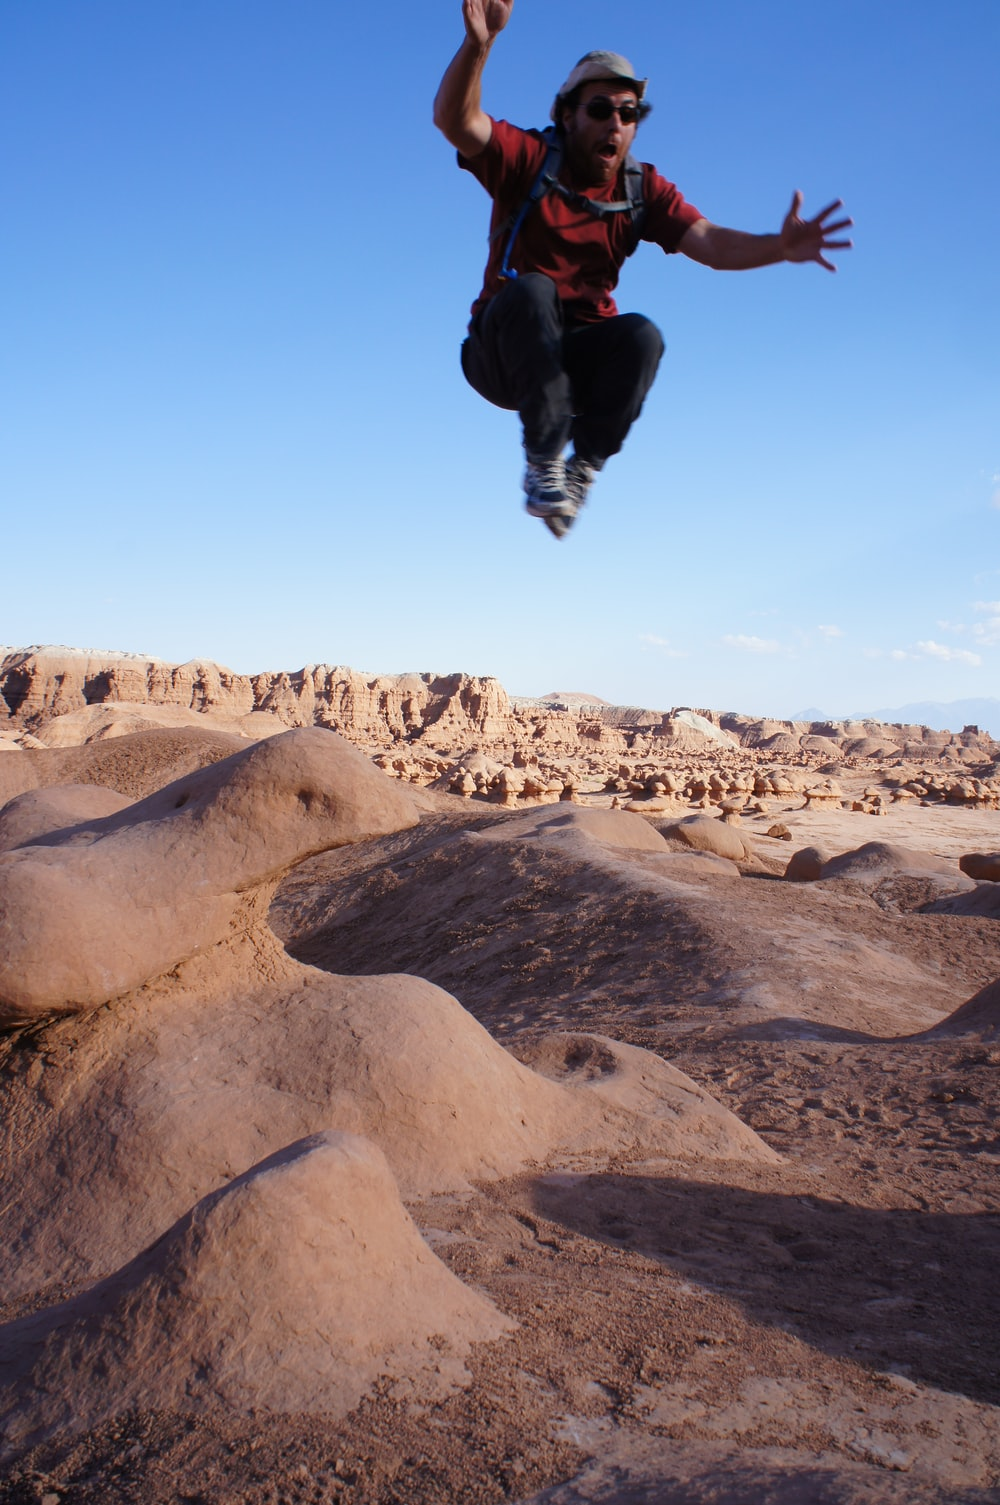 man jumped on desert during daytime